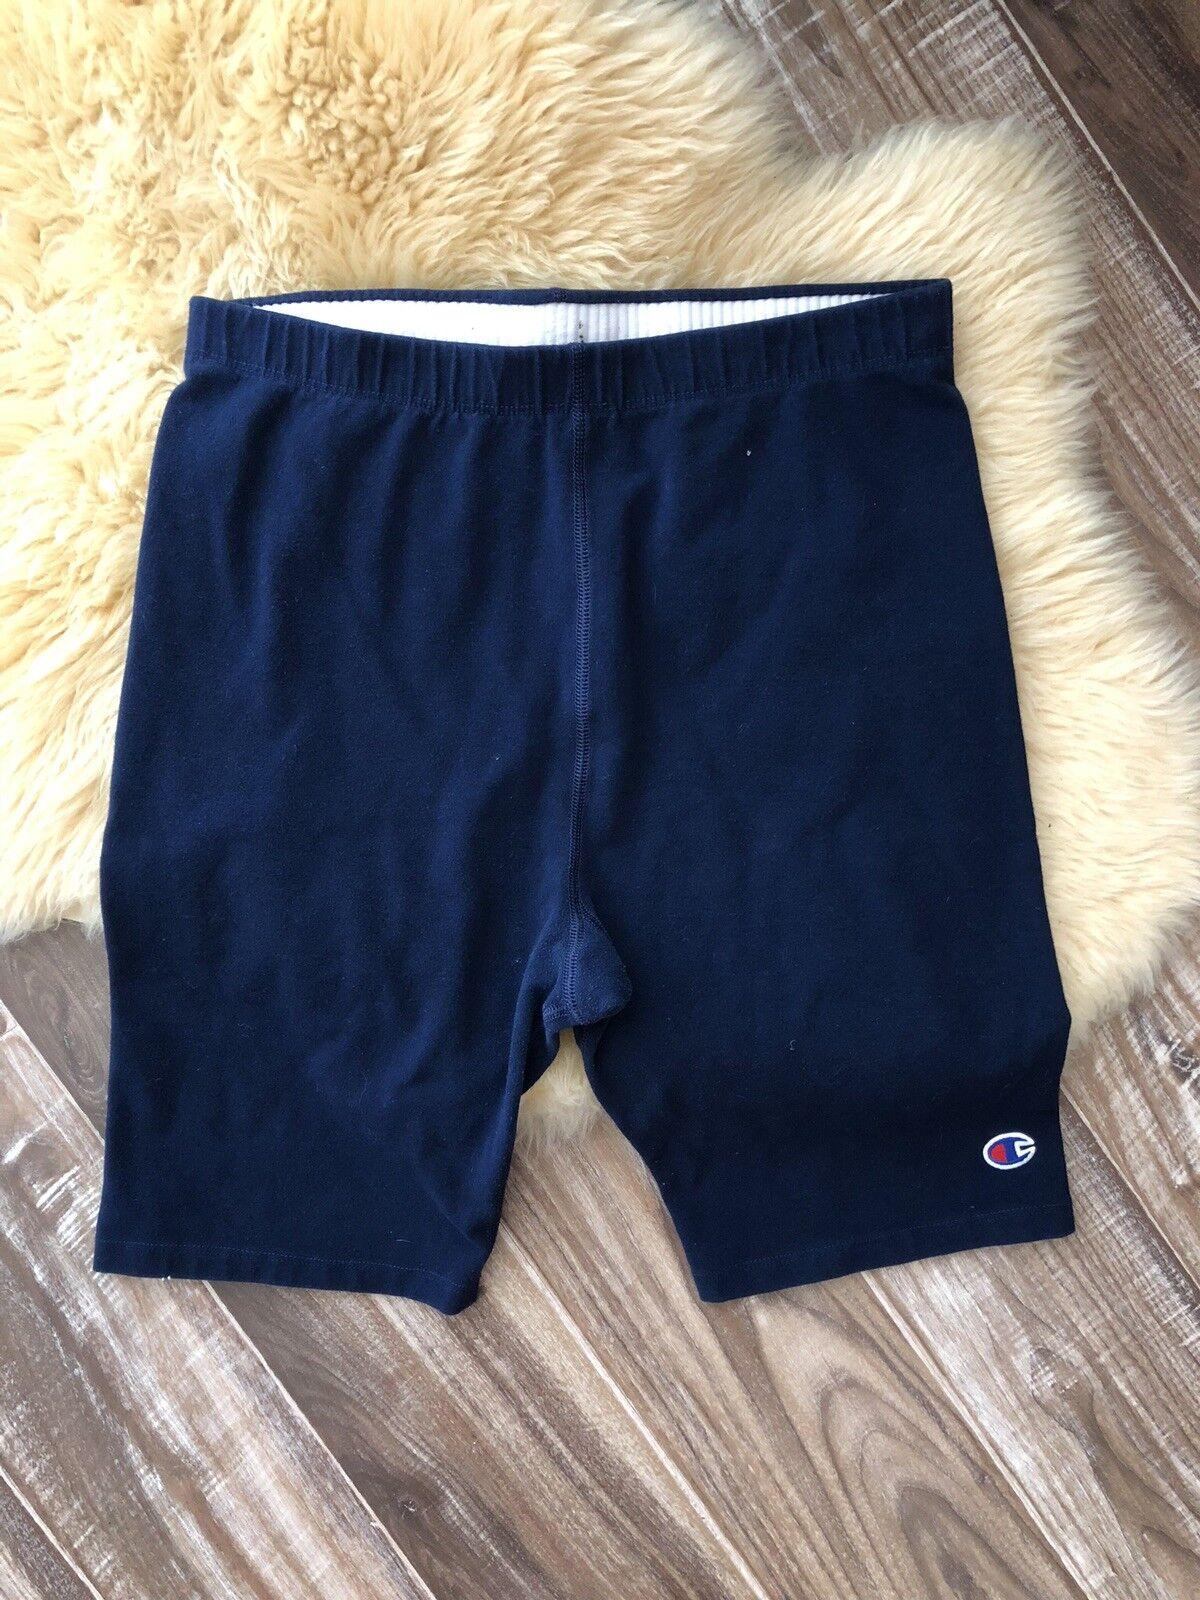 Unisex Vintage 80's Navy bluee Spandex Shorts Champion Size XXL Tights Made USA